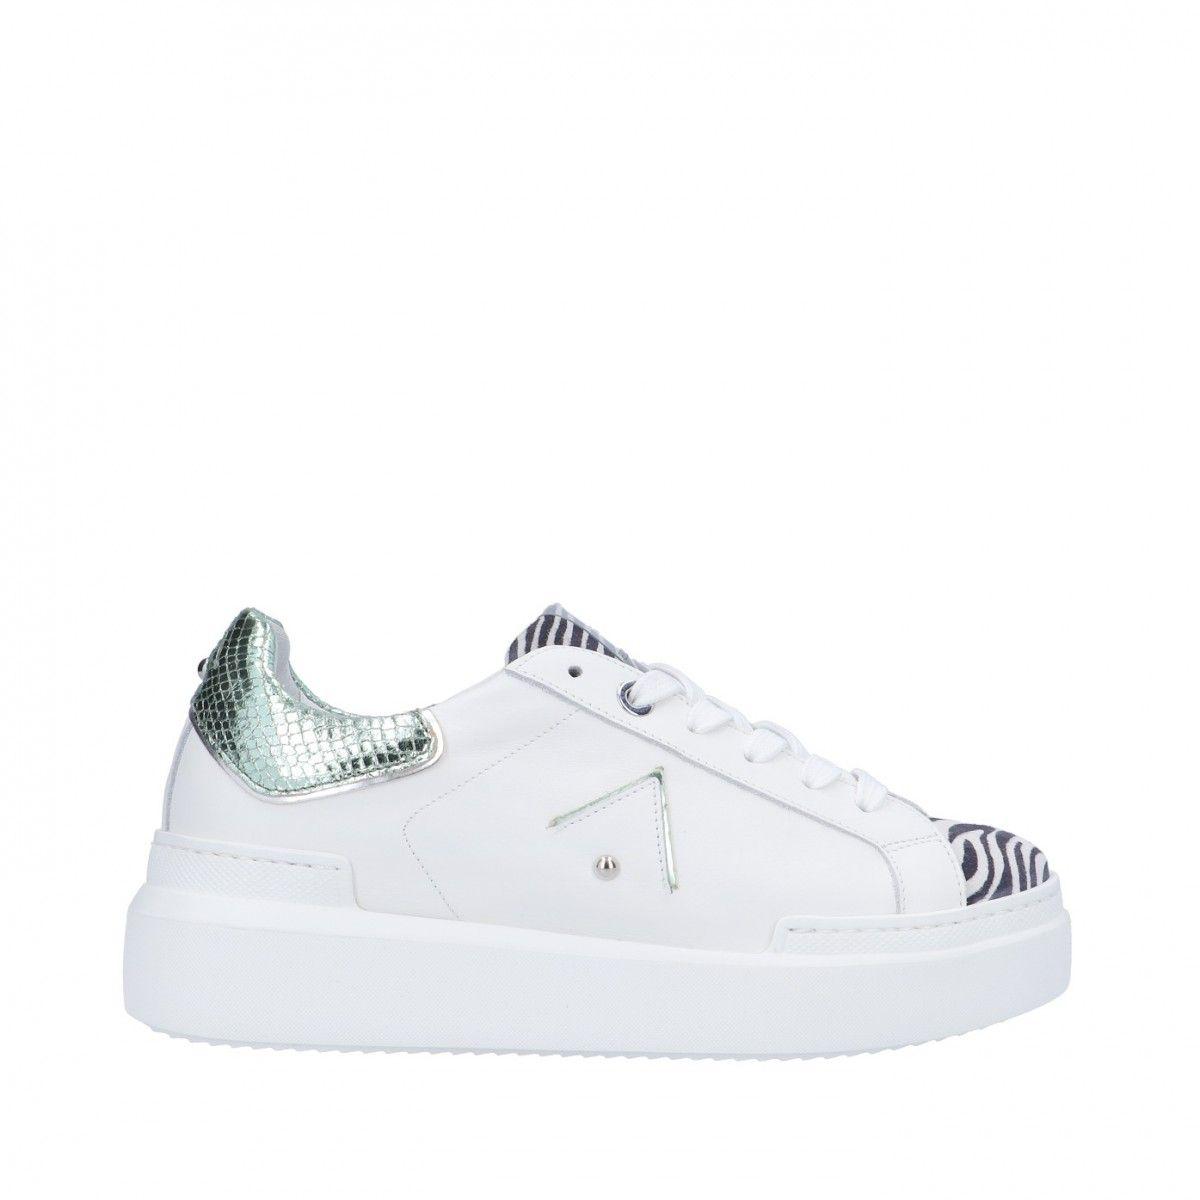 Ed parrish Sneaker Bianco/celeste Gomma CKLD-AD11